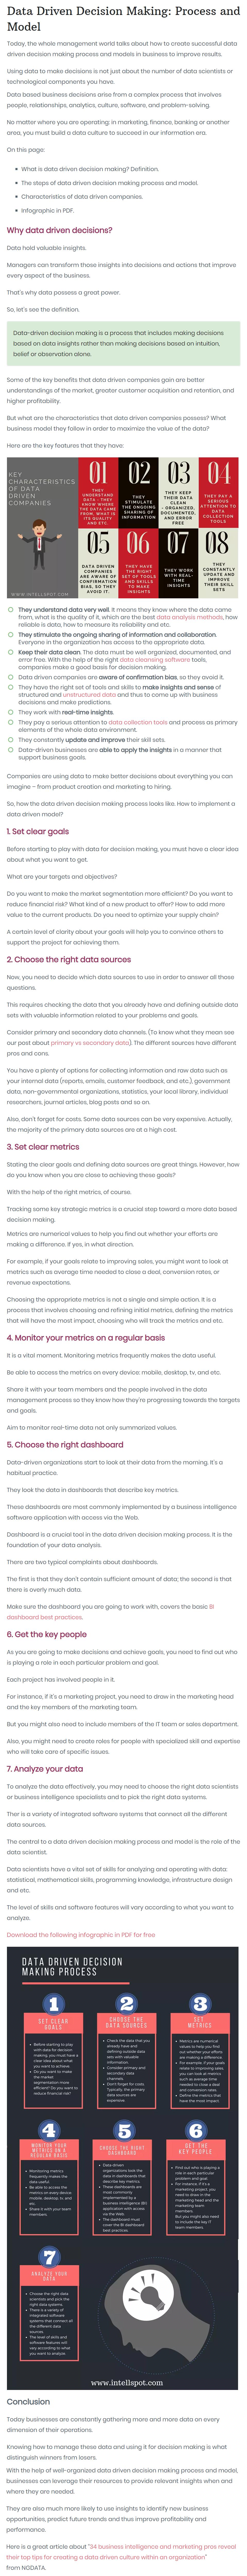 data-driven decision-making process